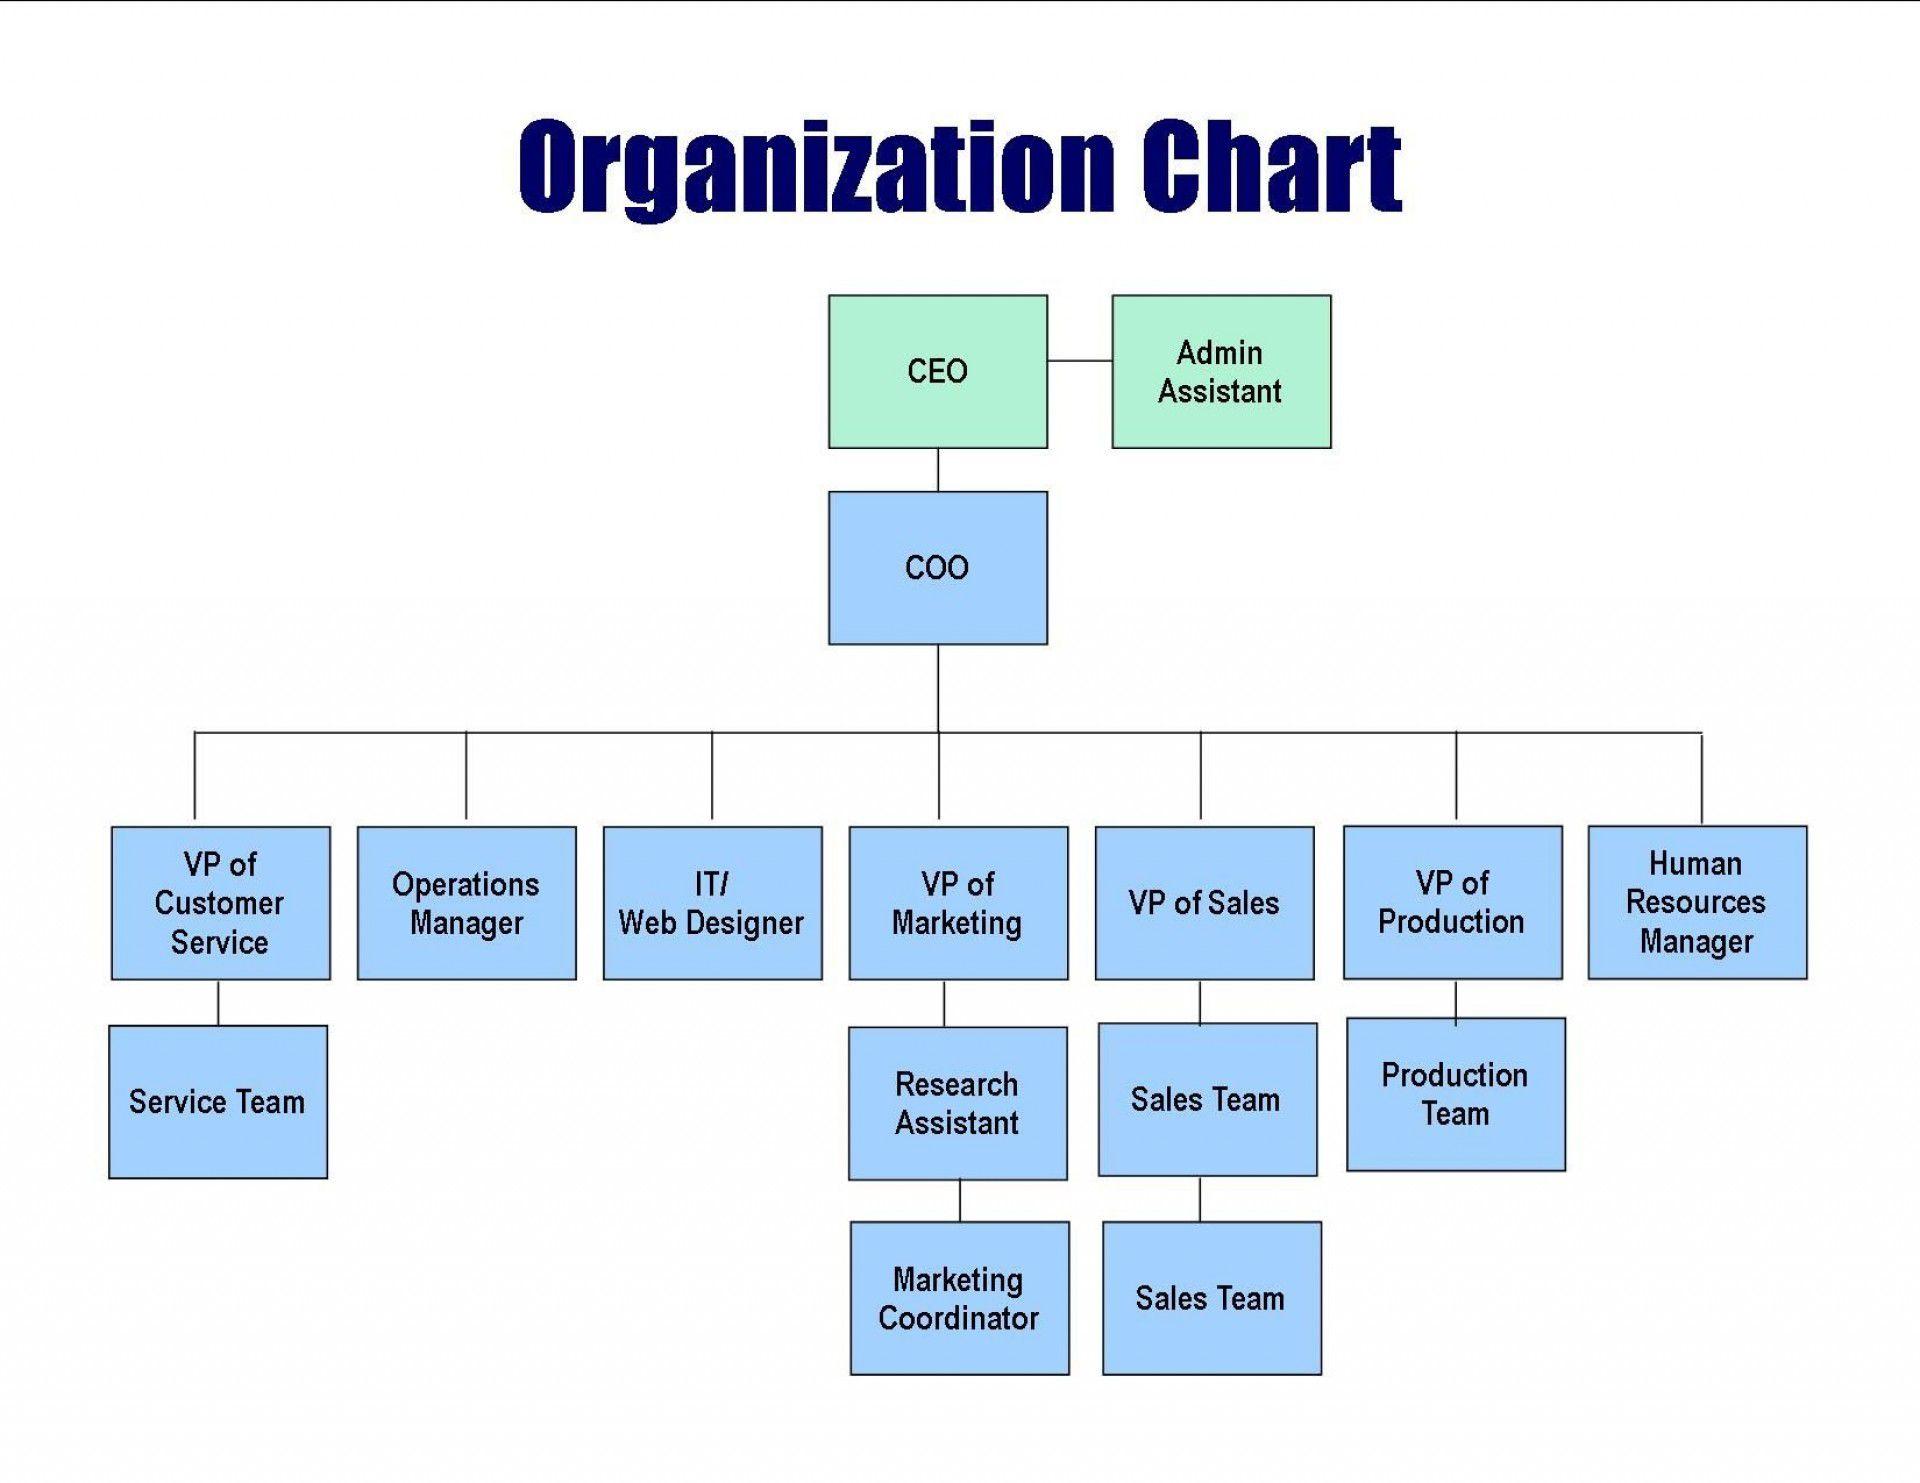 004 Rare Organizational Chart Template Word Concept  2013 2010 2007Full